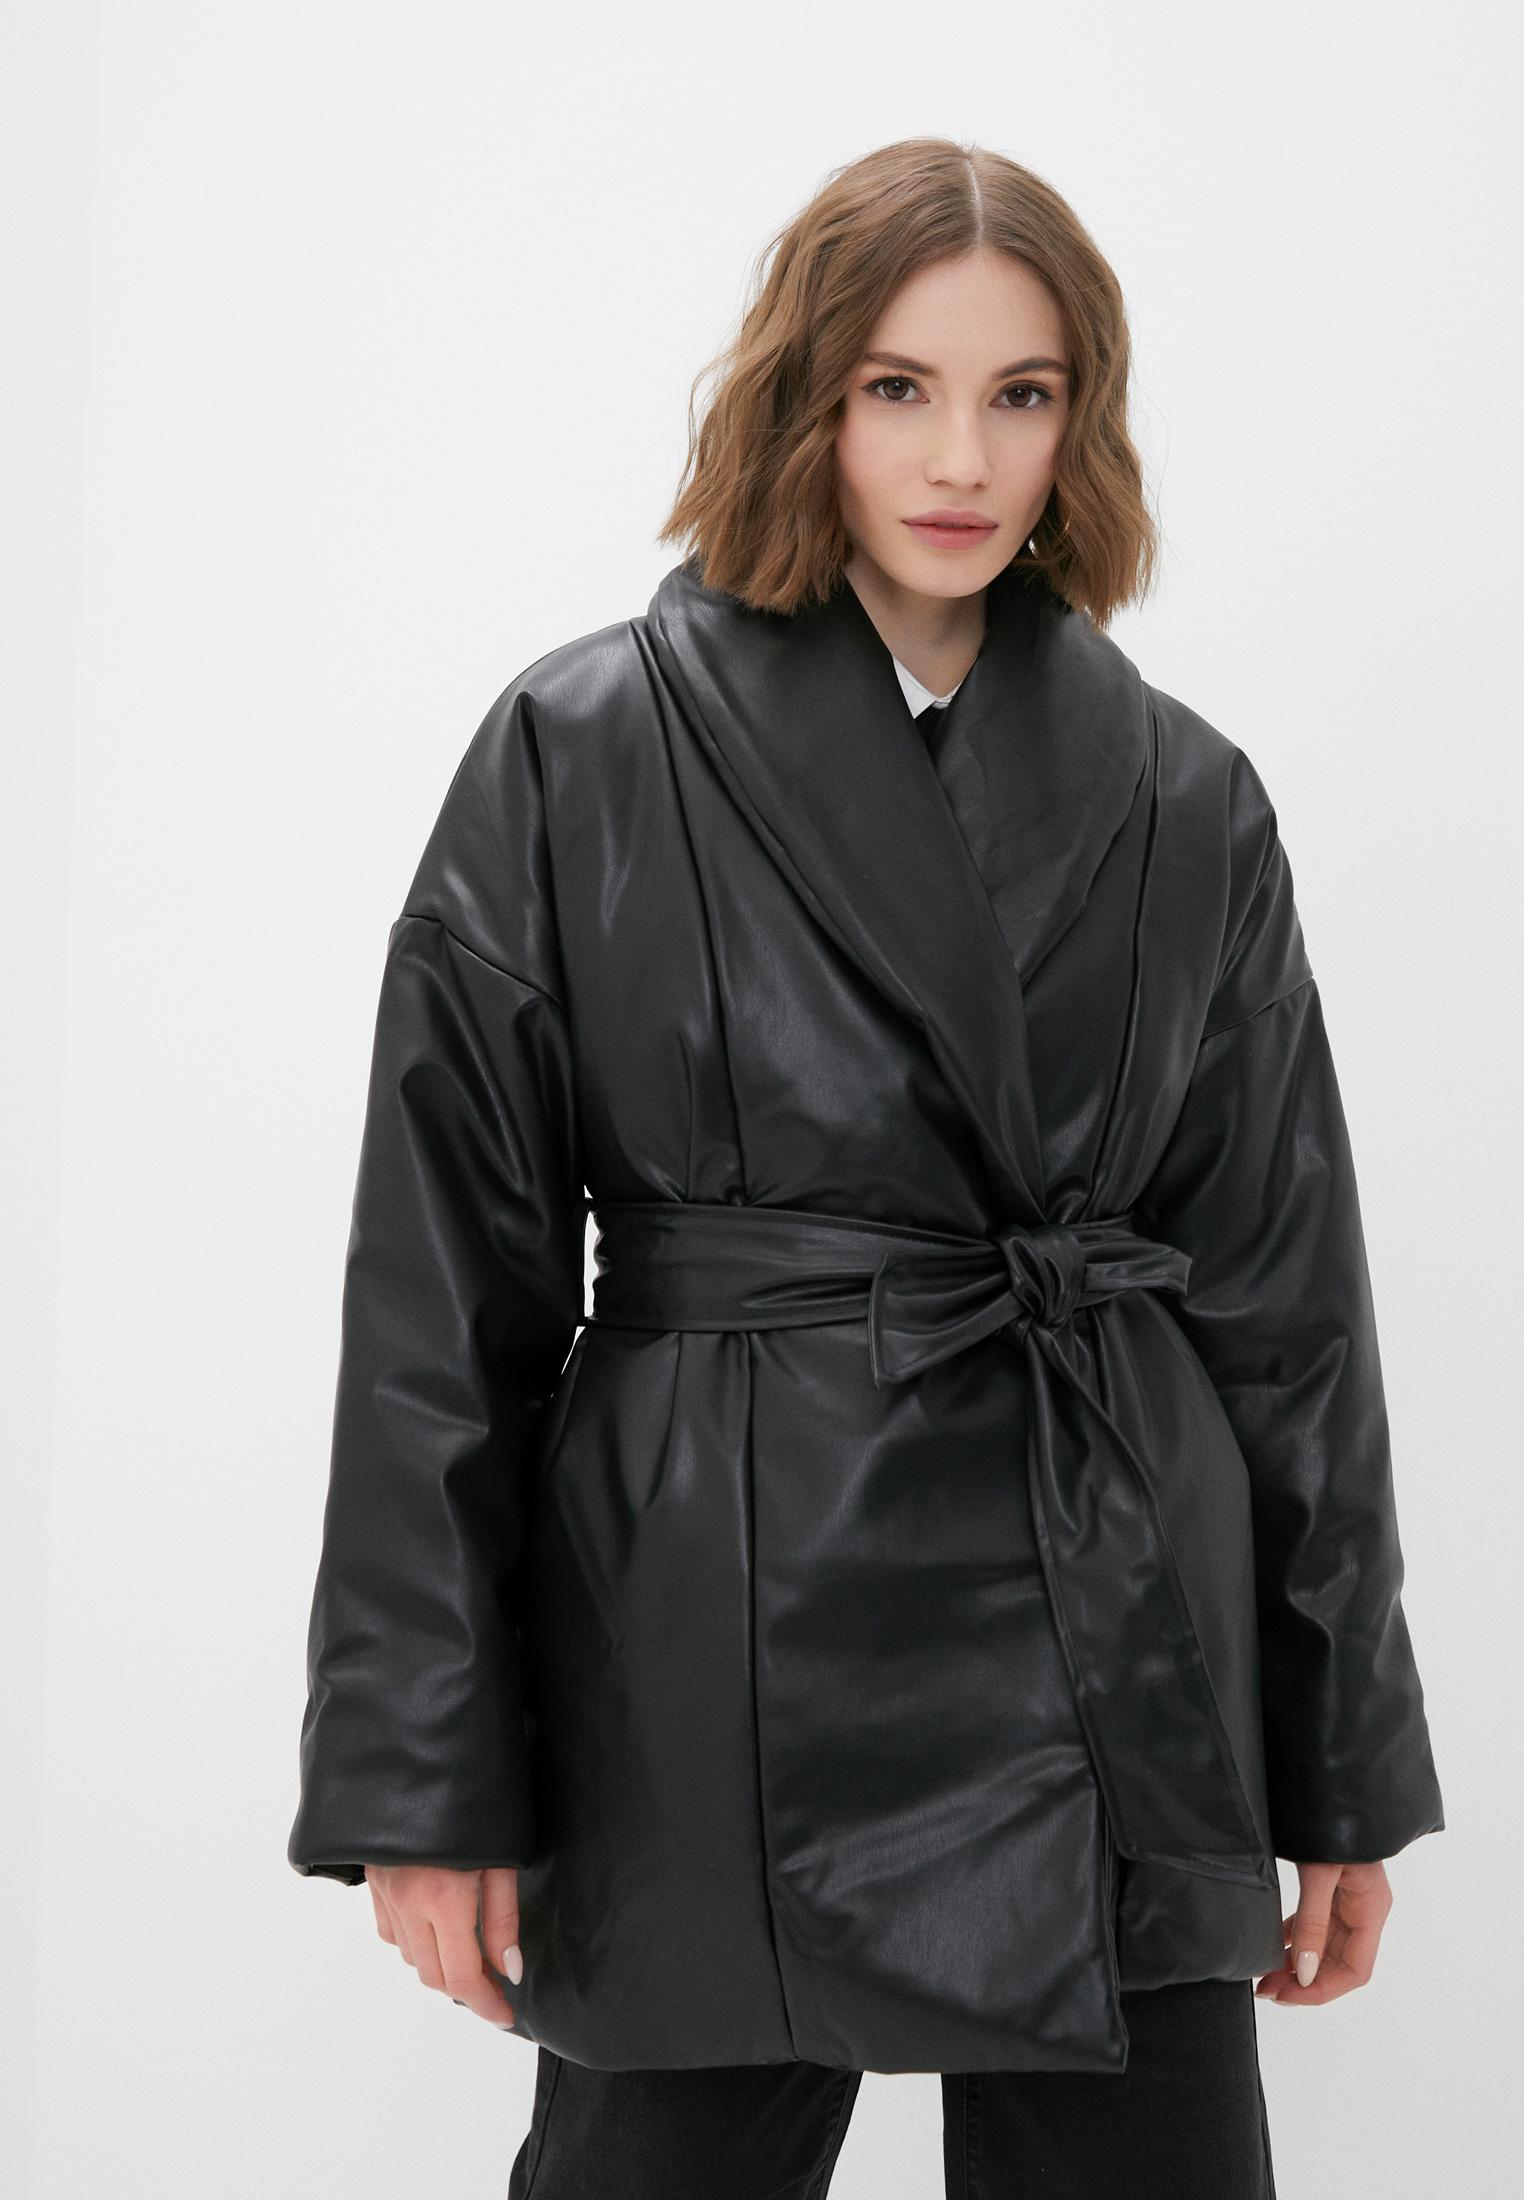 Кожаная куртка Imocean VL21-17499